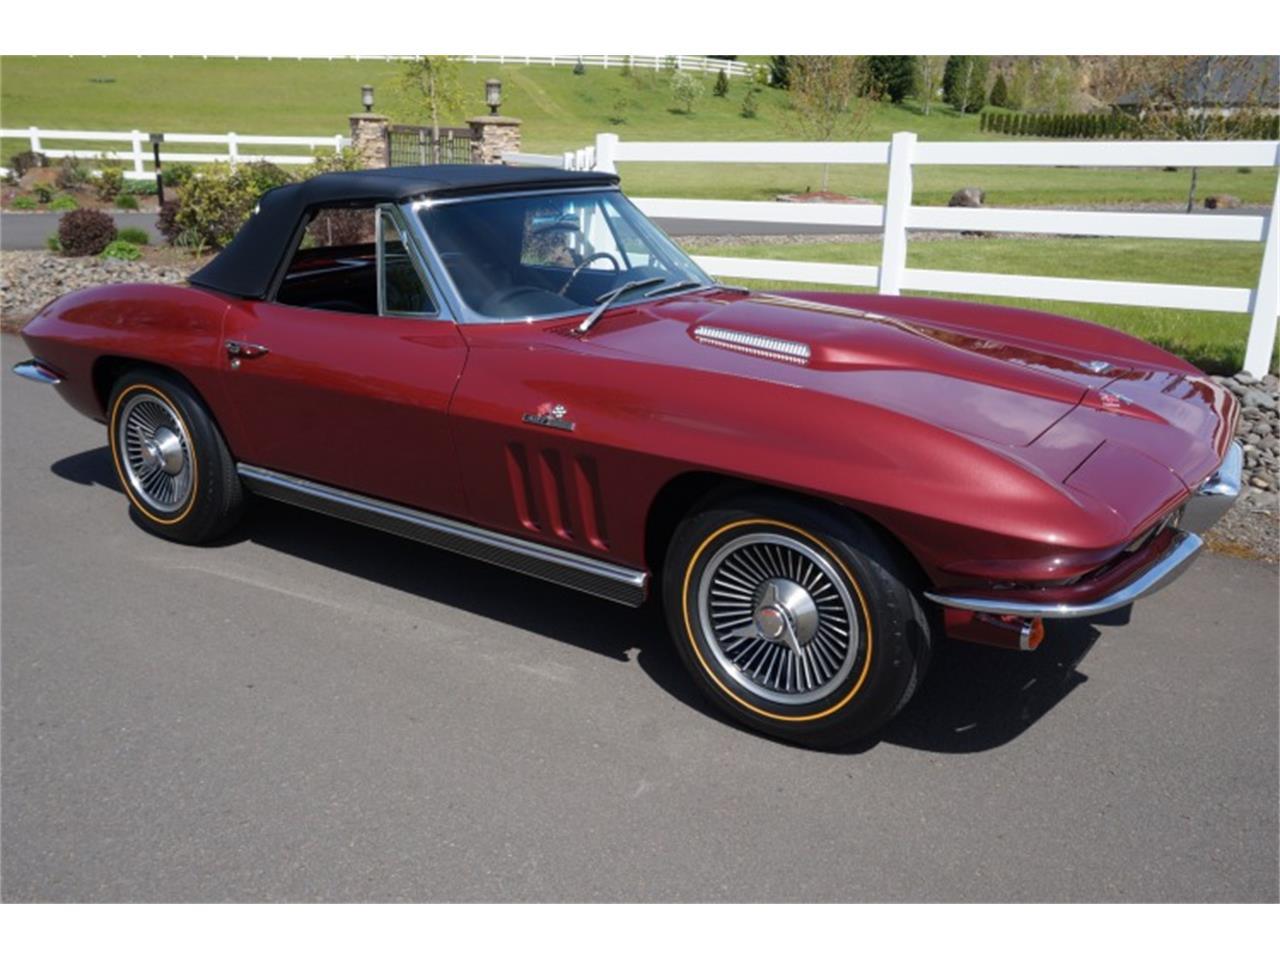 Large Picture of '66 Chevrolet Corvette located in Nevada - QJUW